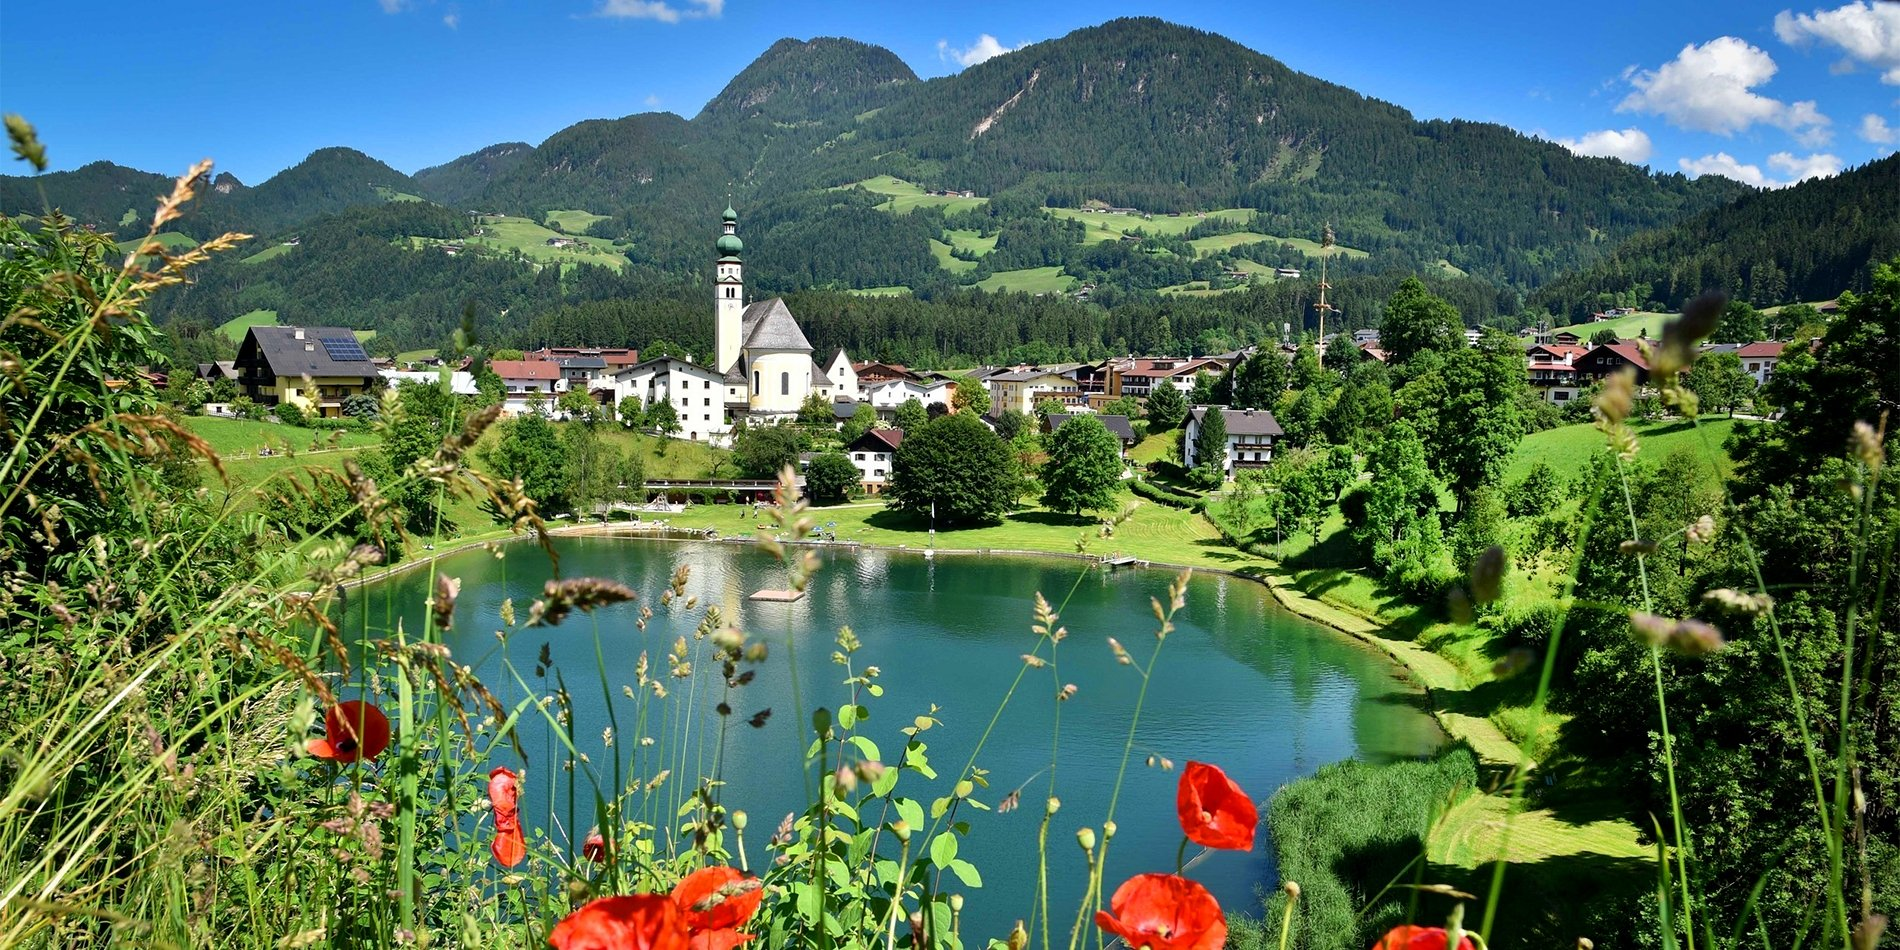 © Alpbachtal Seenland Tourismus / G. Grießenböck